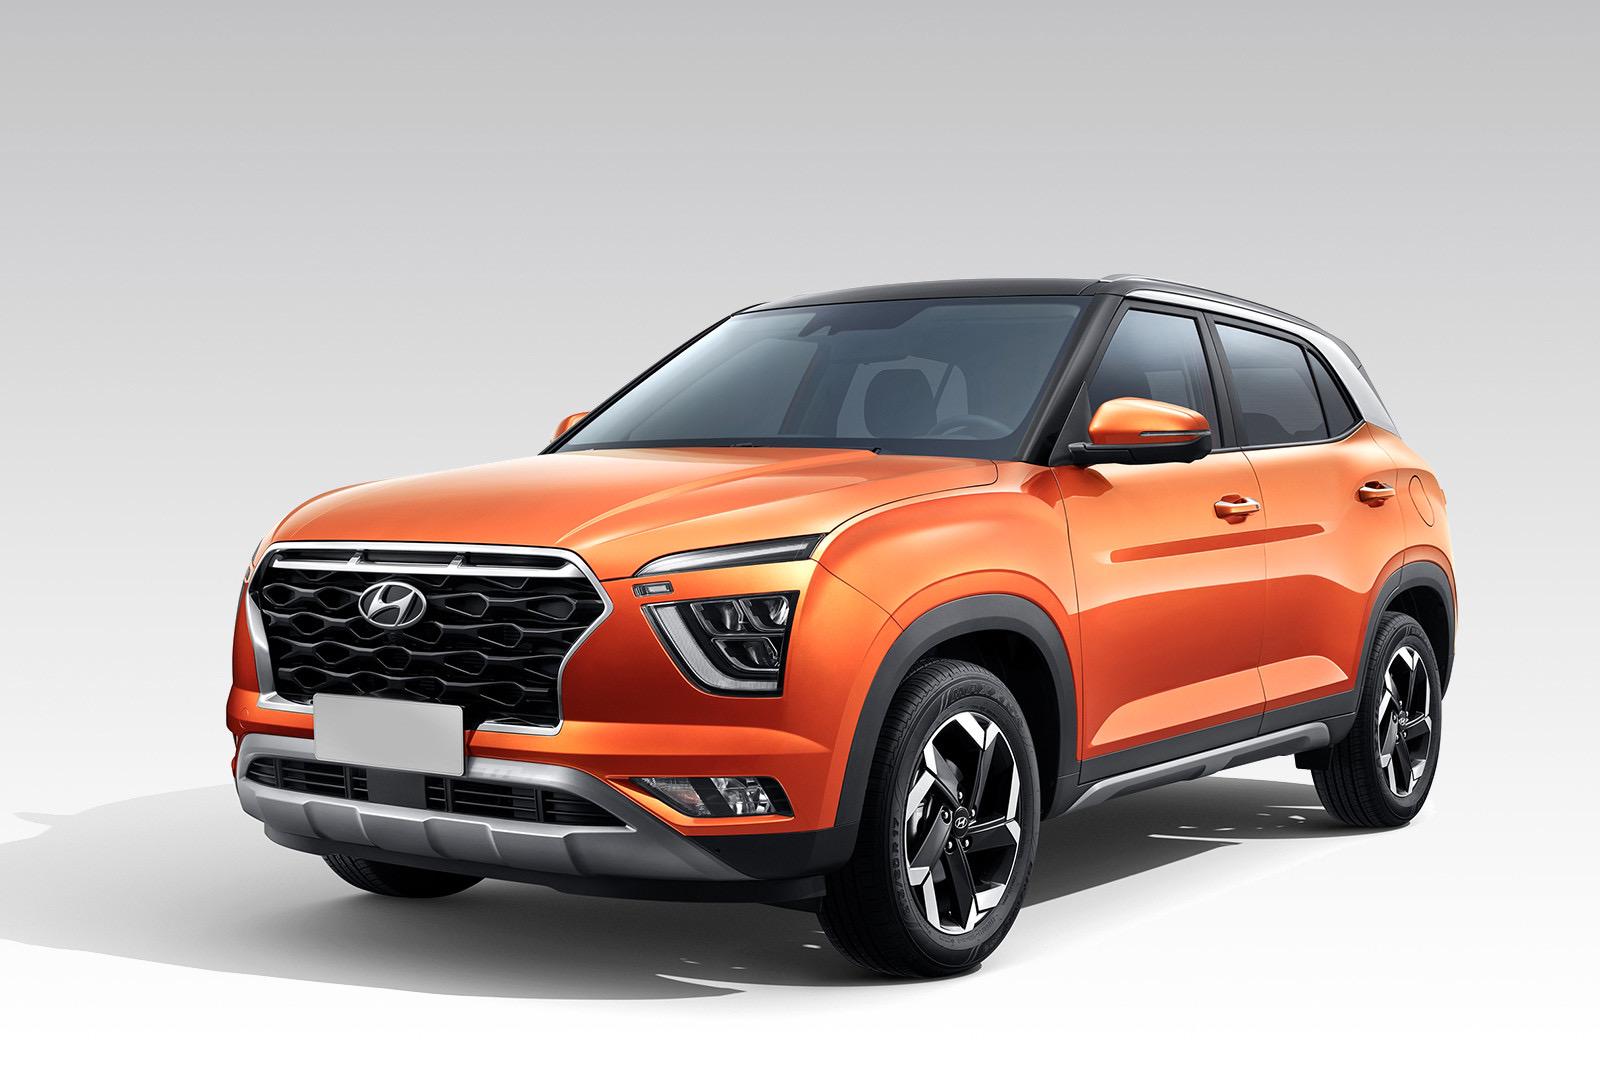 La Hyundai Creta se transforma para su modelo 2021